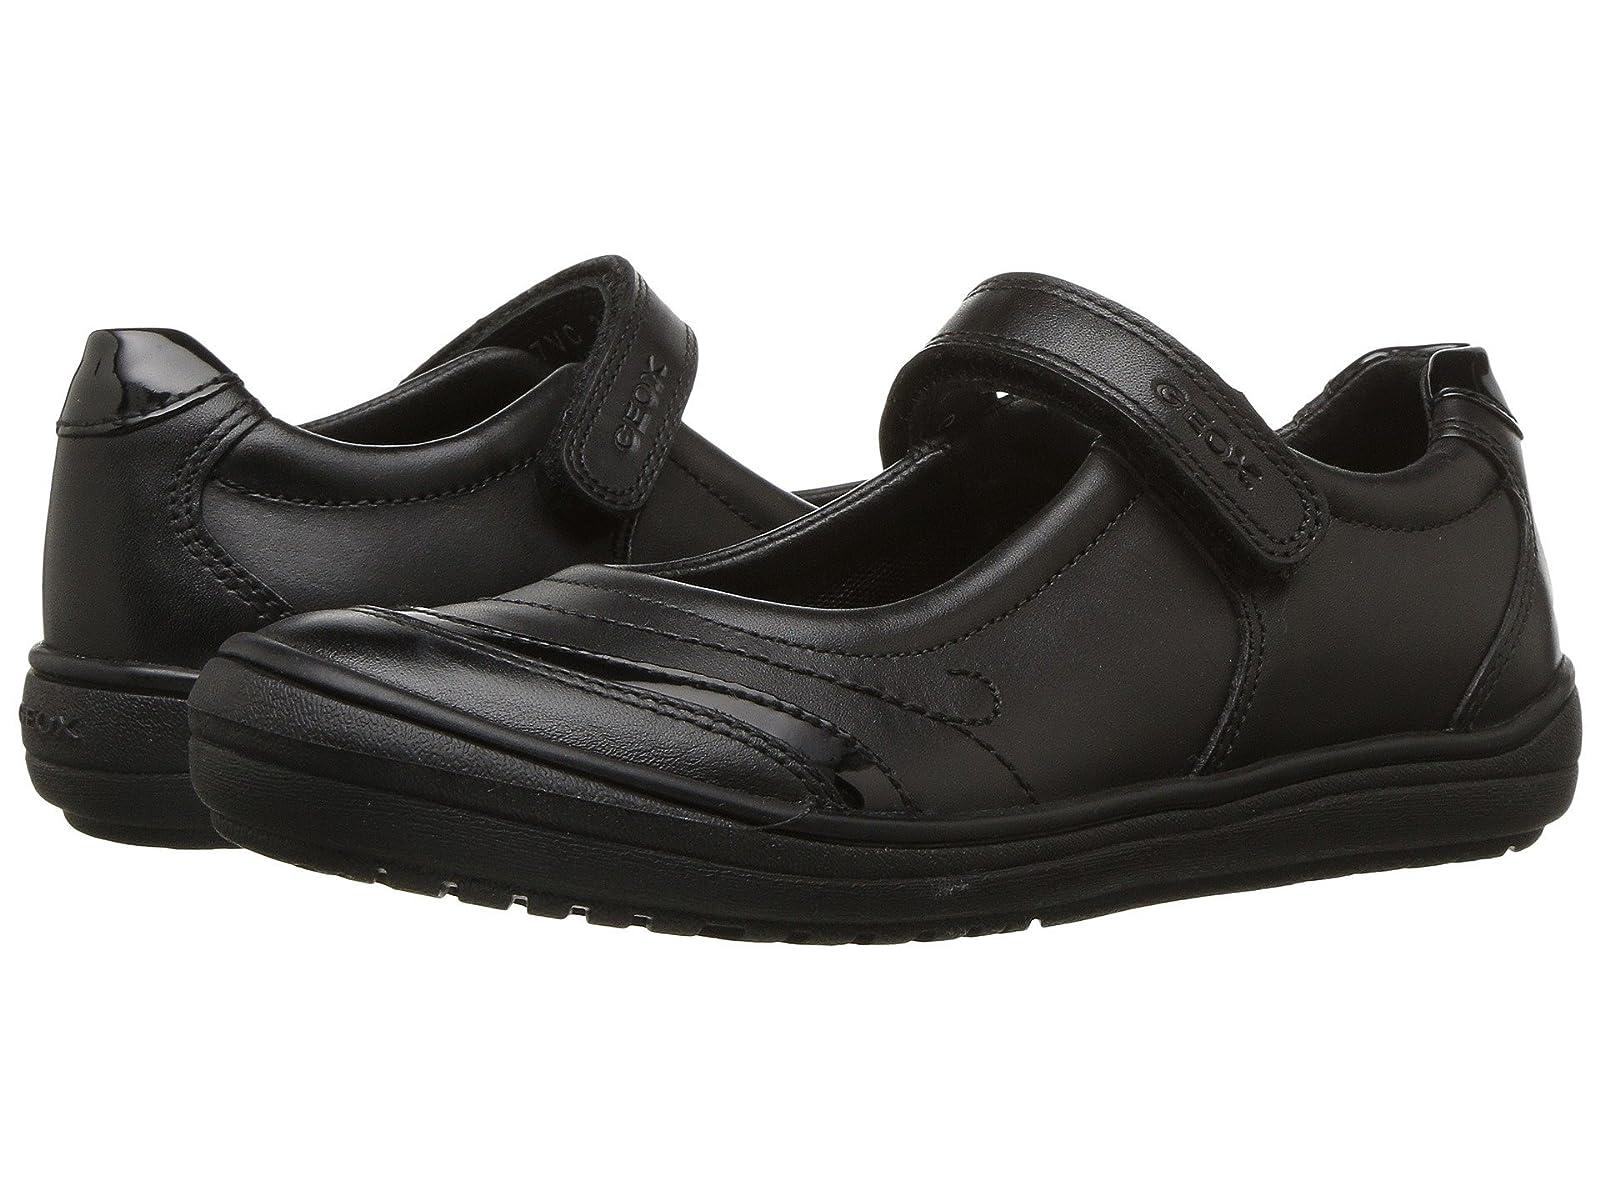 Geox Kids Hadriel Girl 1 (Little Kid/Big Kid)Atmospheric grades have affordable shoes